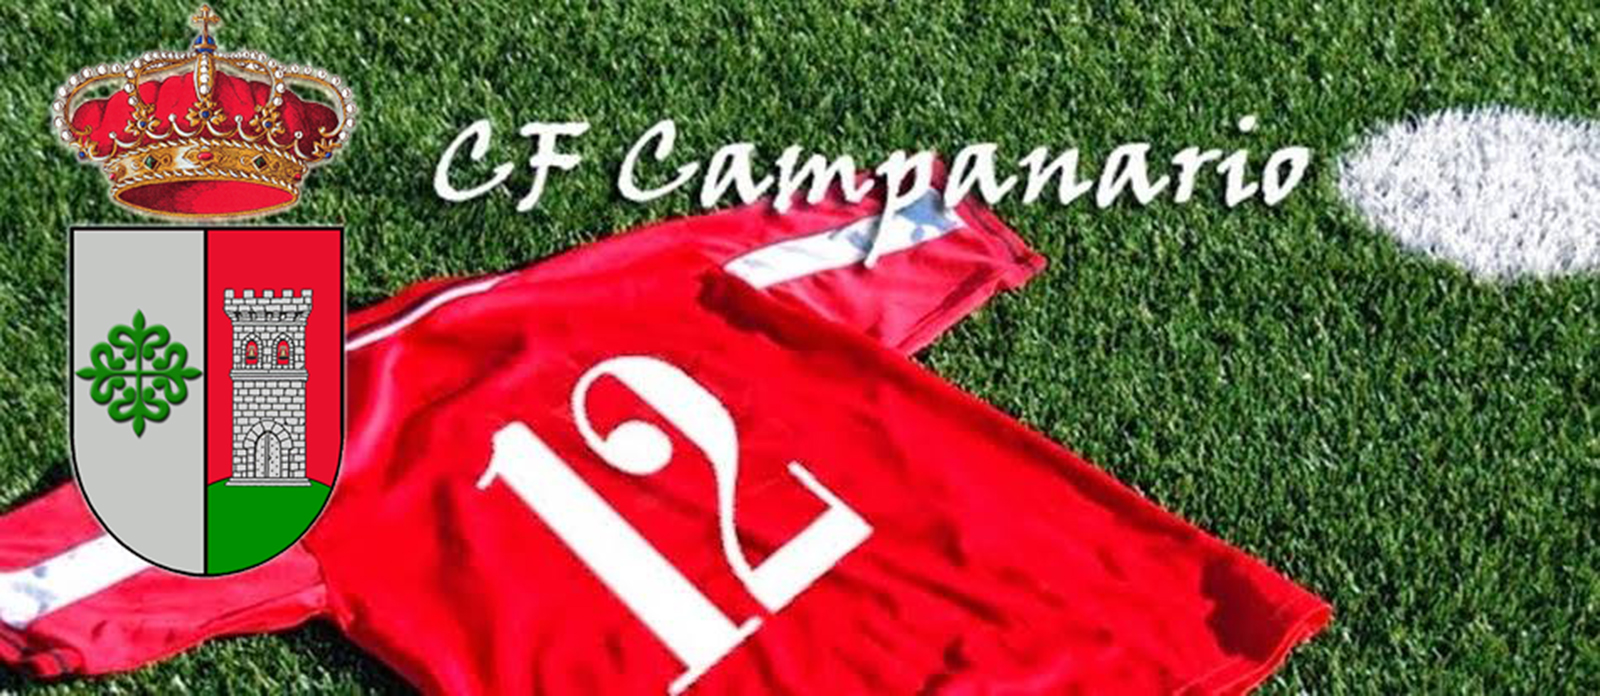 "El Campo de Fútbol Municipal ""El Ejido"" se tiñe de rojo ... 2e9f74517c86e"